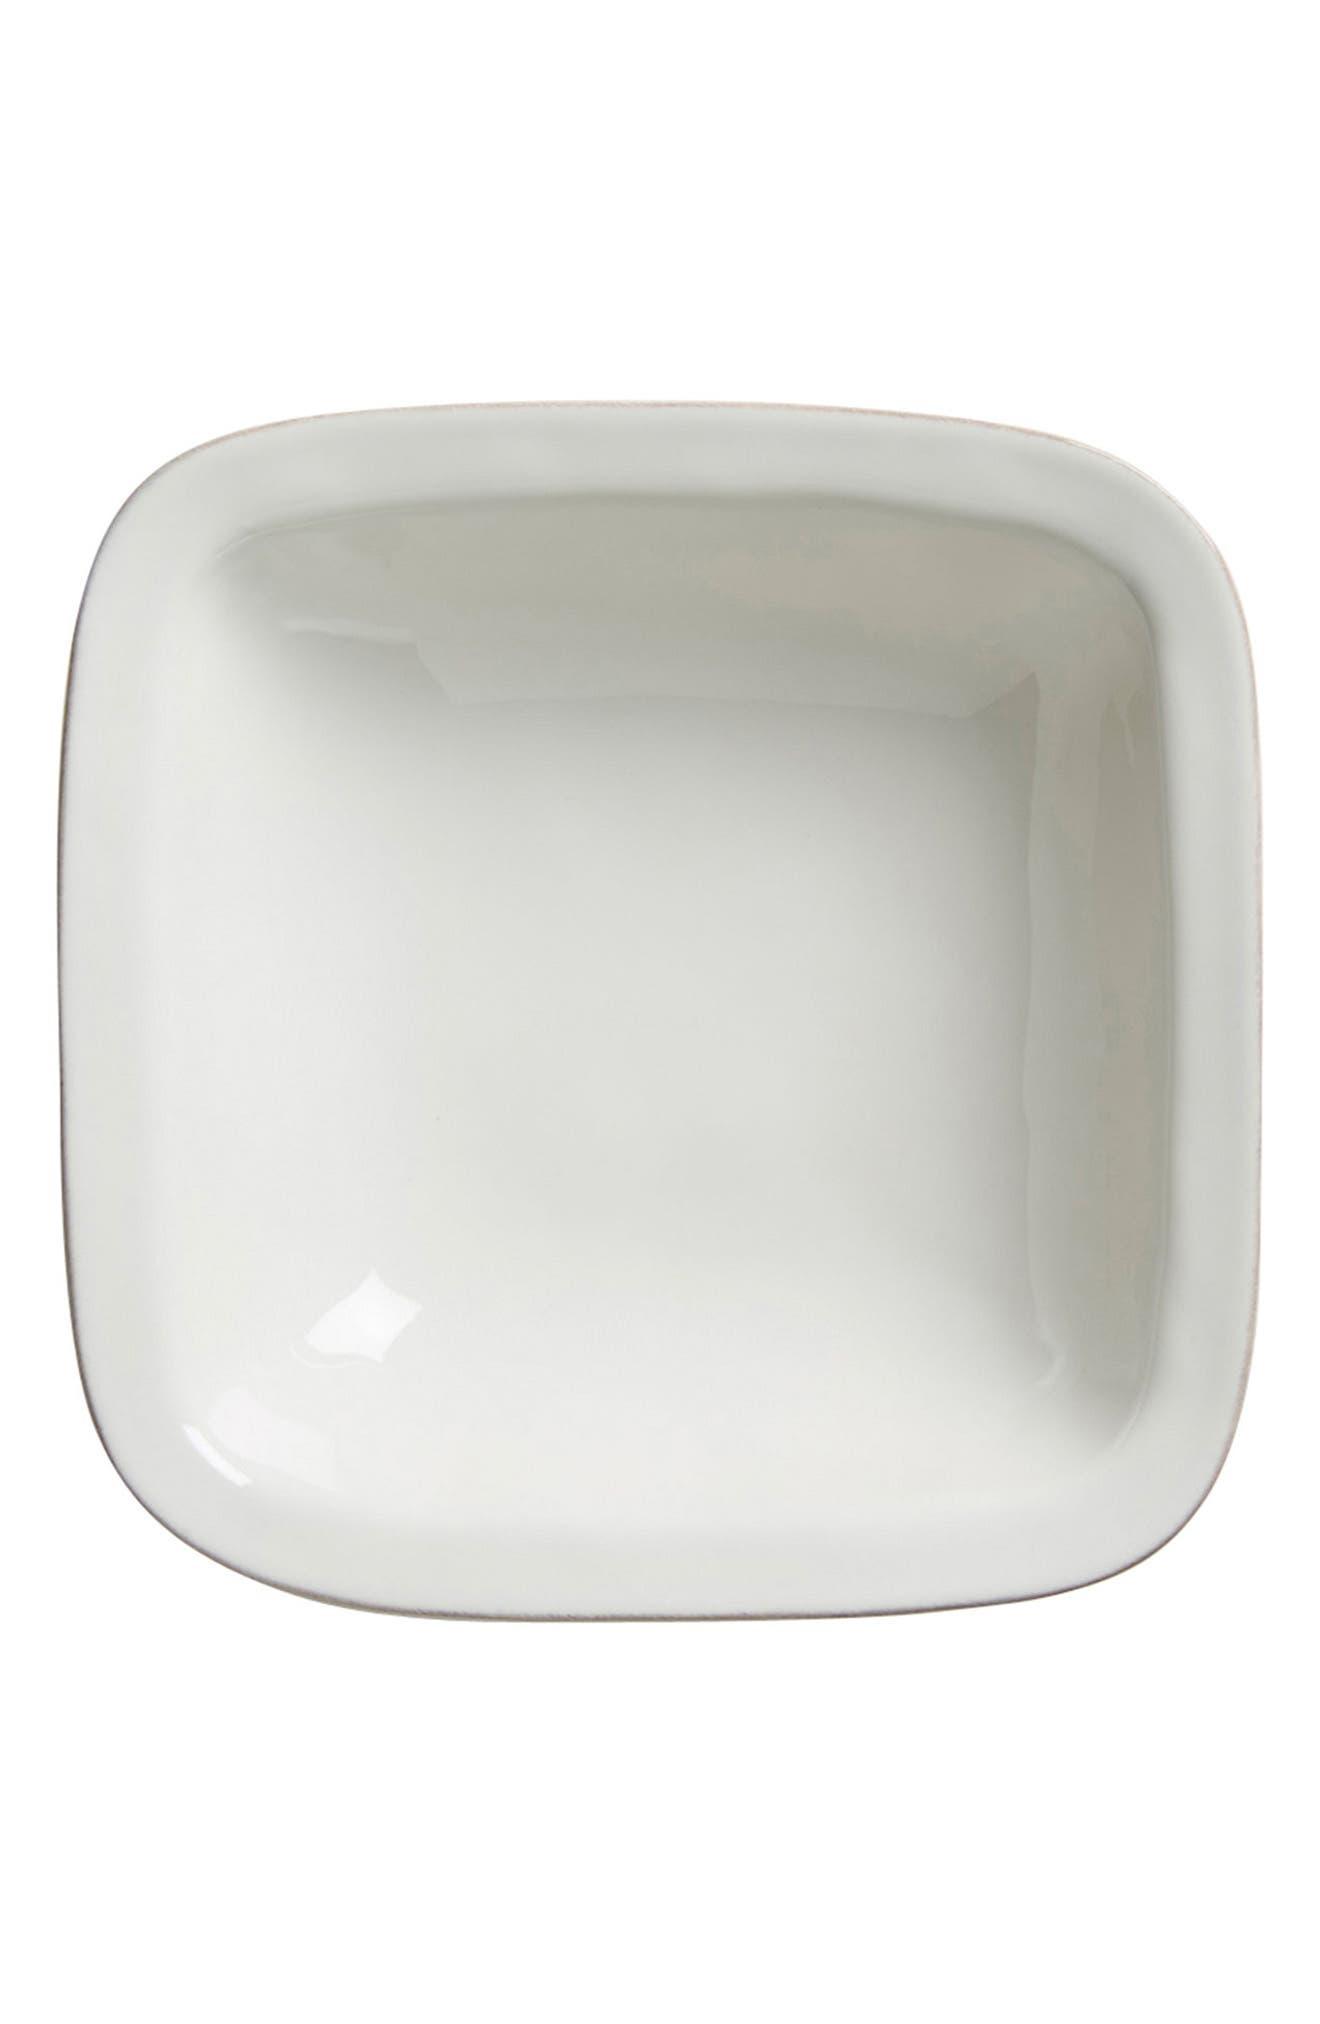 Puro Ceramic Serving Bowl,                             Main thumbnail 1, color,                             WHITEWASH